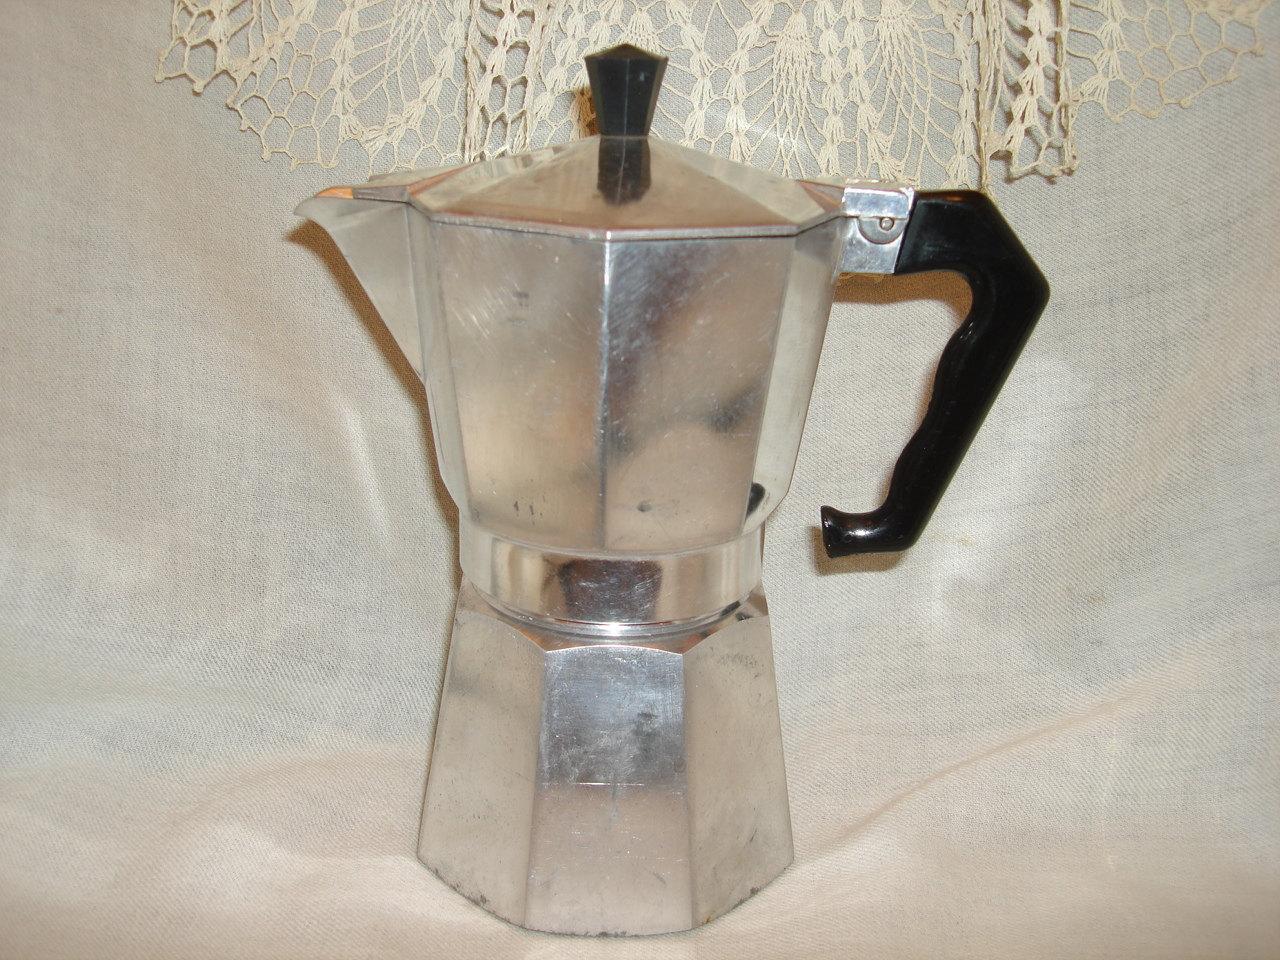 Old Espresso Maker ~ Vintage kitchen espresso coffee maker junior express made in